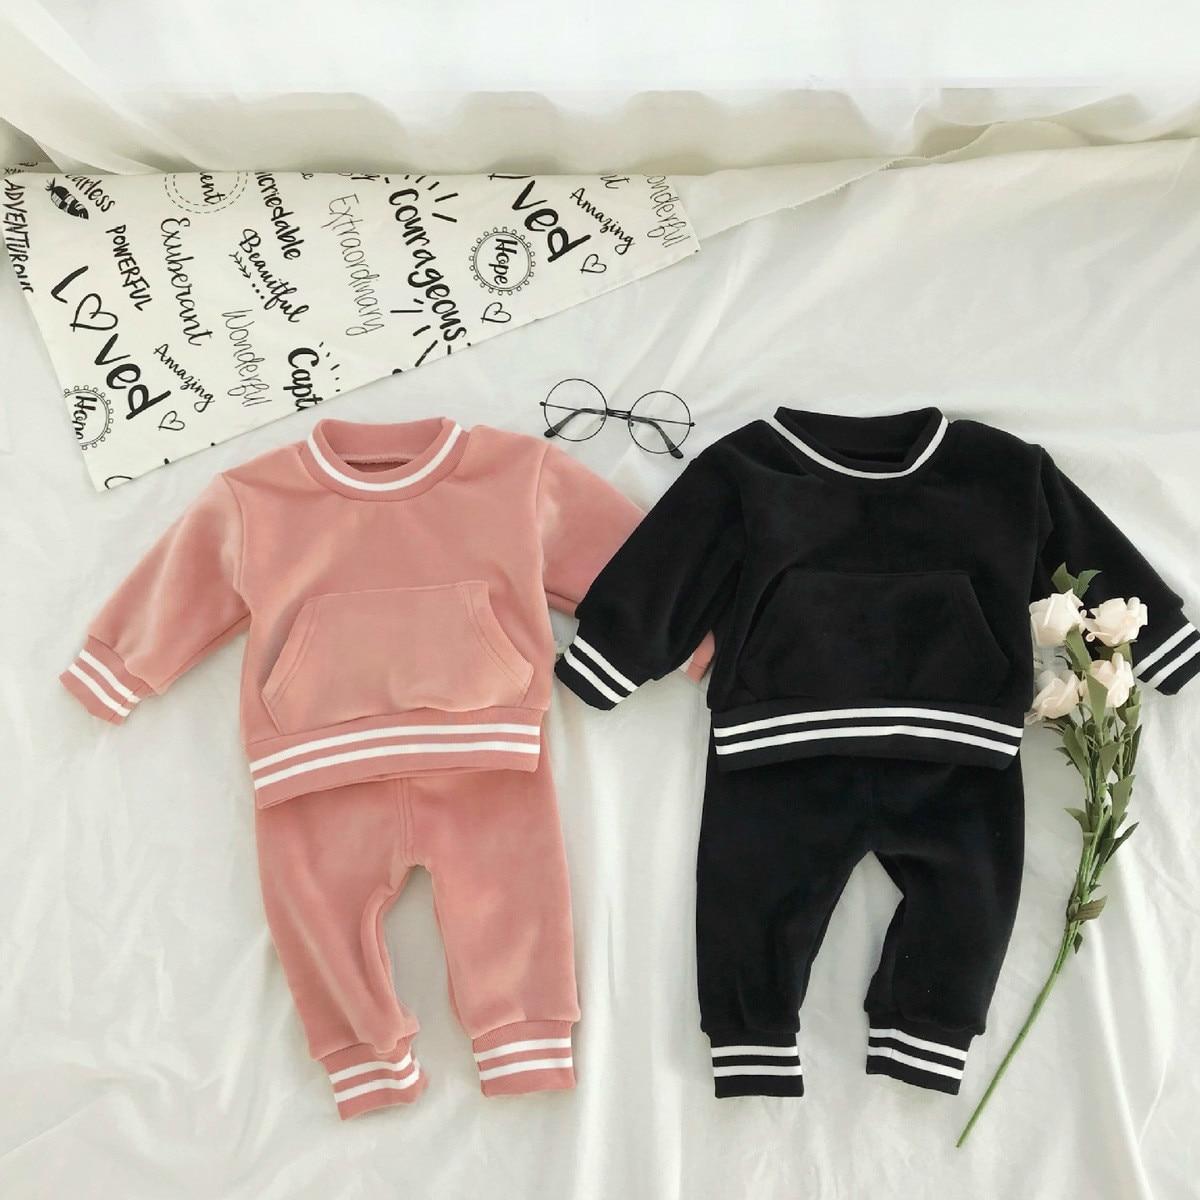 Clothes-Sets Sweatshirts Velvet Kids Pants Girls Baby Boys New-Fashion Infant Gold Cotton